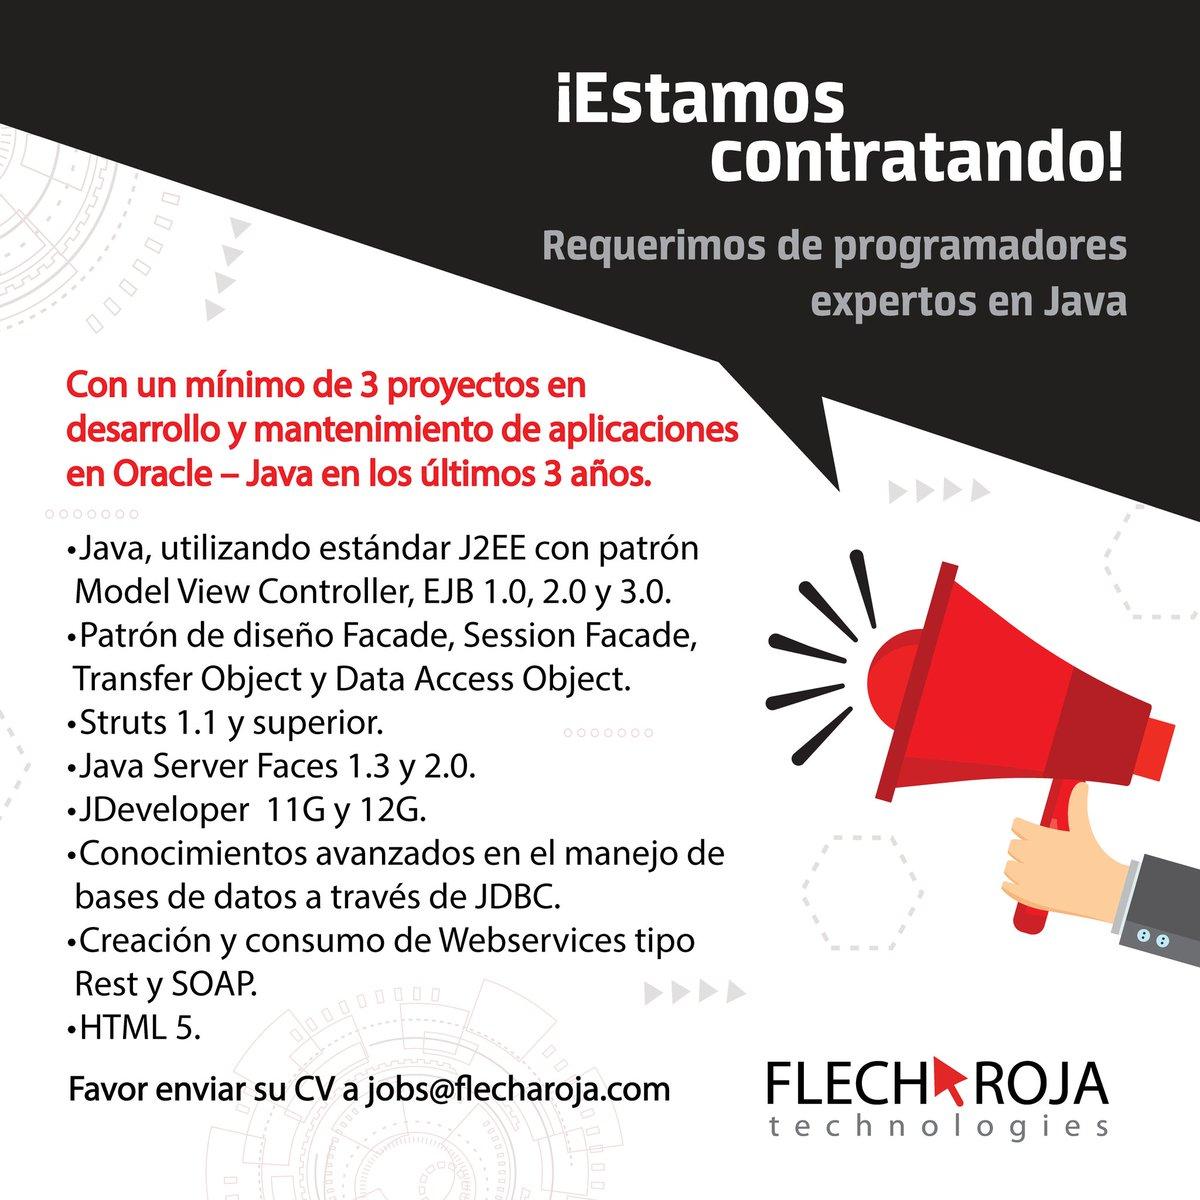 Estamos contratando programadores expertos en Java. Envíenos su CV a jobs@flecharoja.com #FlechaRoja #Jobs #Java https://t.co/iGguFiidyt